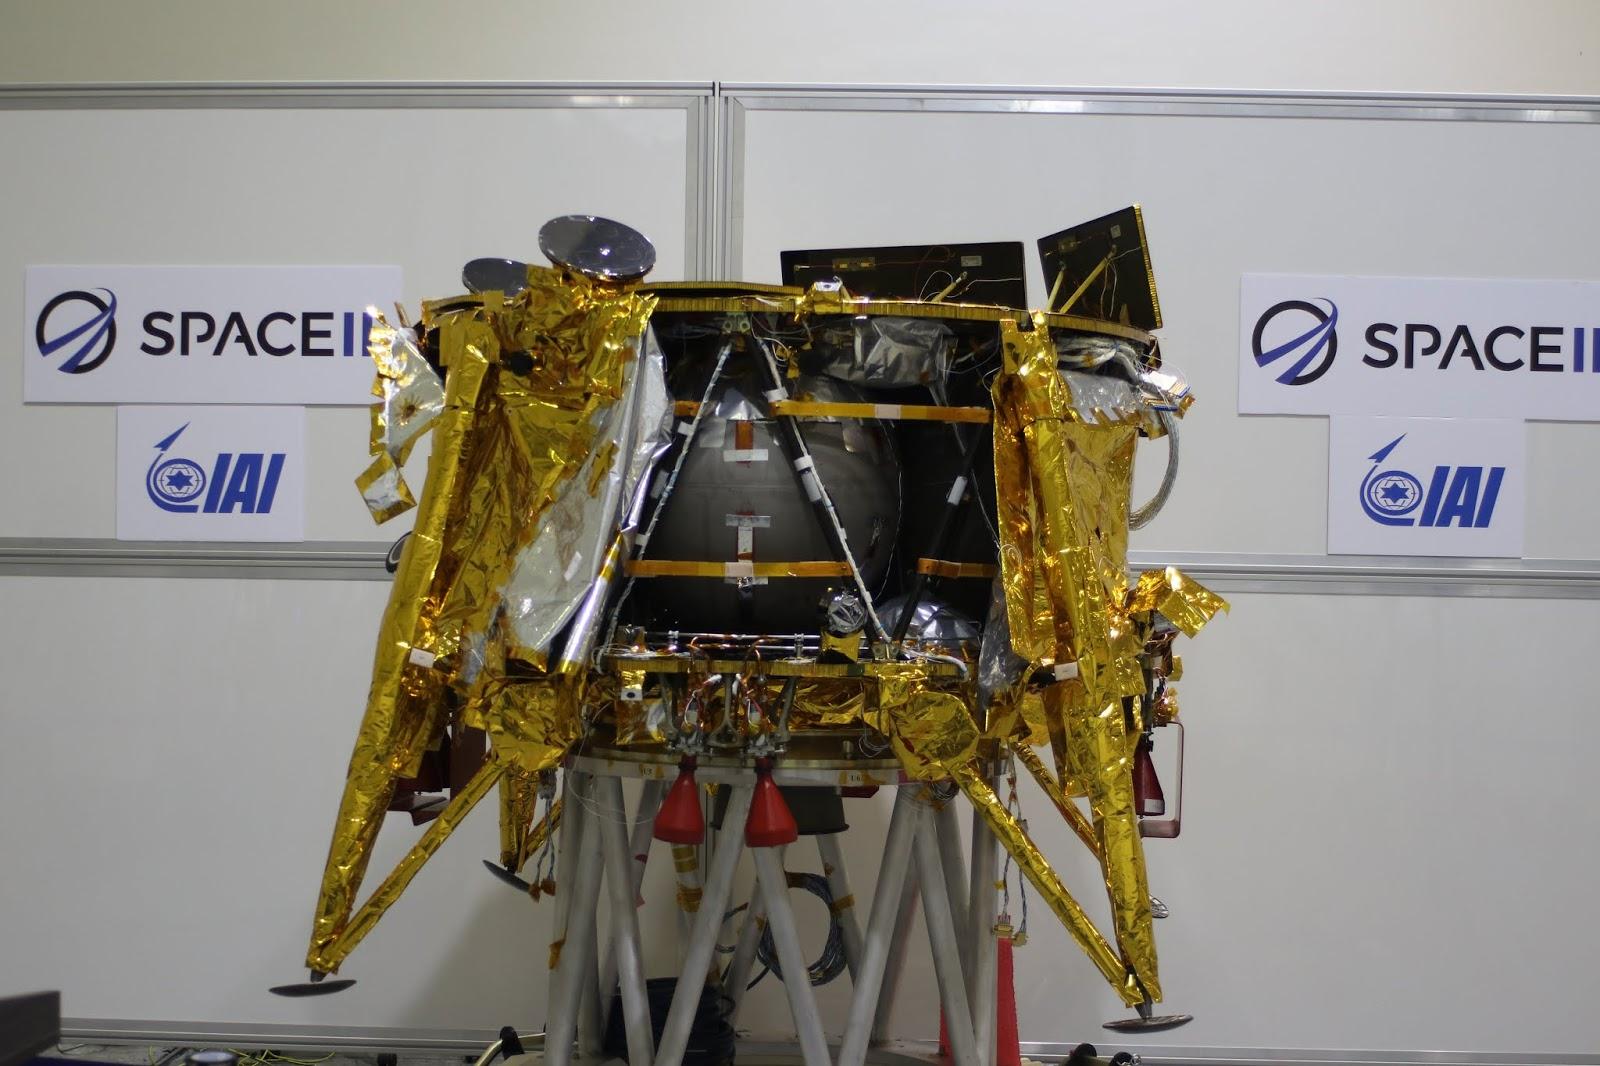 yariv spacecraft - photo #36